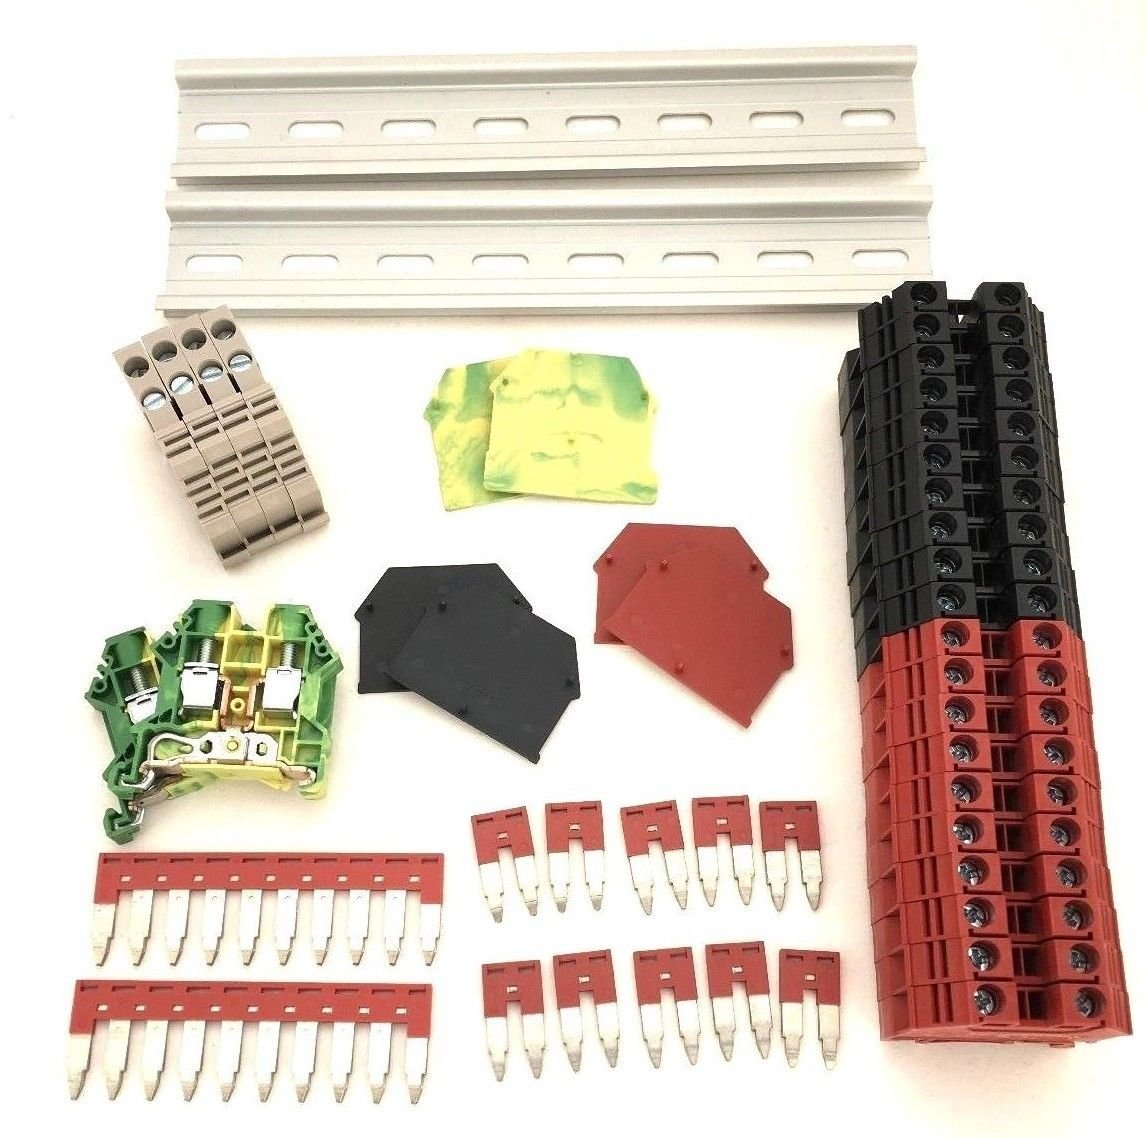 Red/Black DIN Rail Terminal Block Kit Dinkle 20 DK6N 8 AWG Gauge 50A 600V Ground DK6N-PE Jumper DSS6N-02P DSS6N-10P End Covers End Brackets